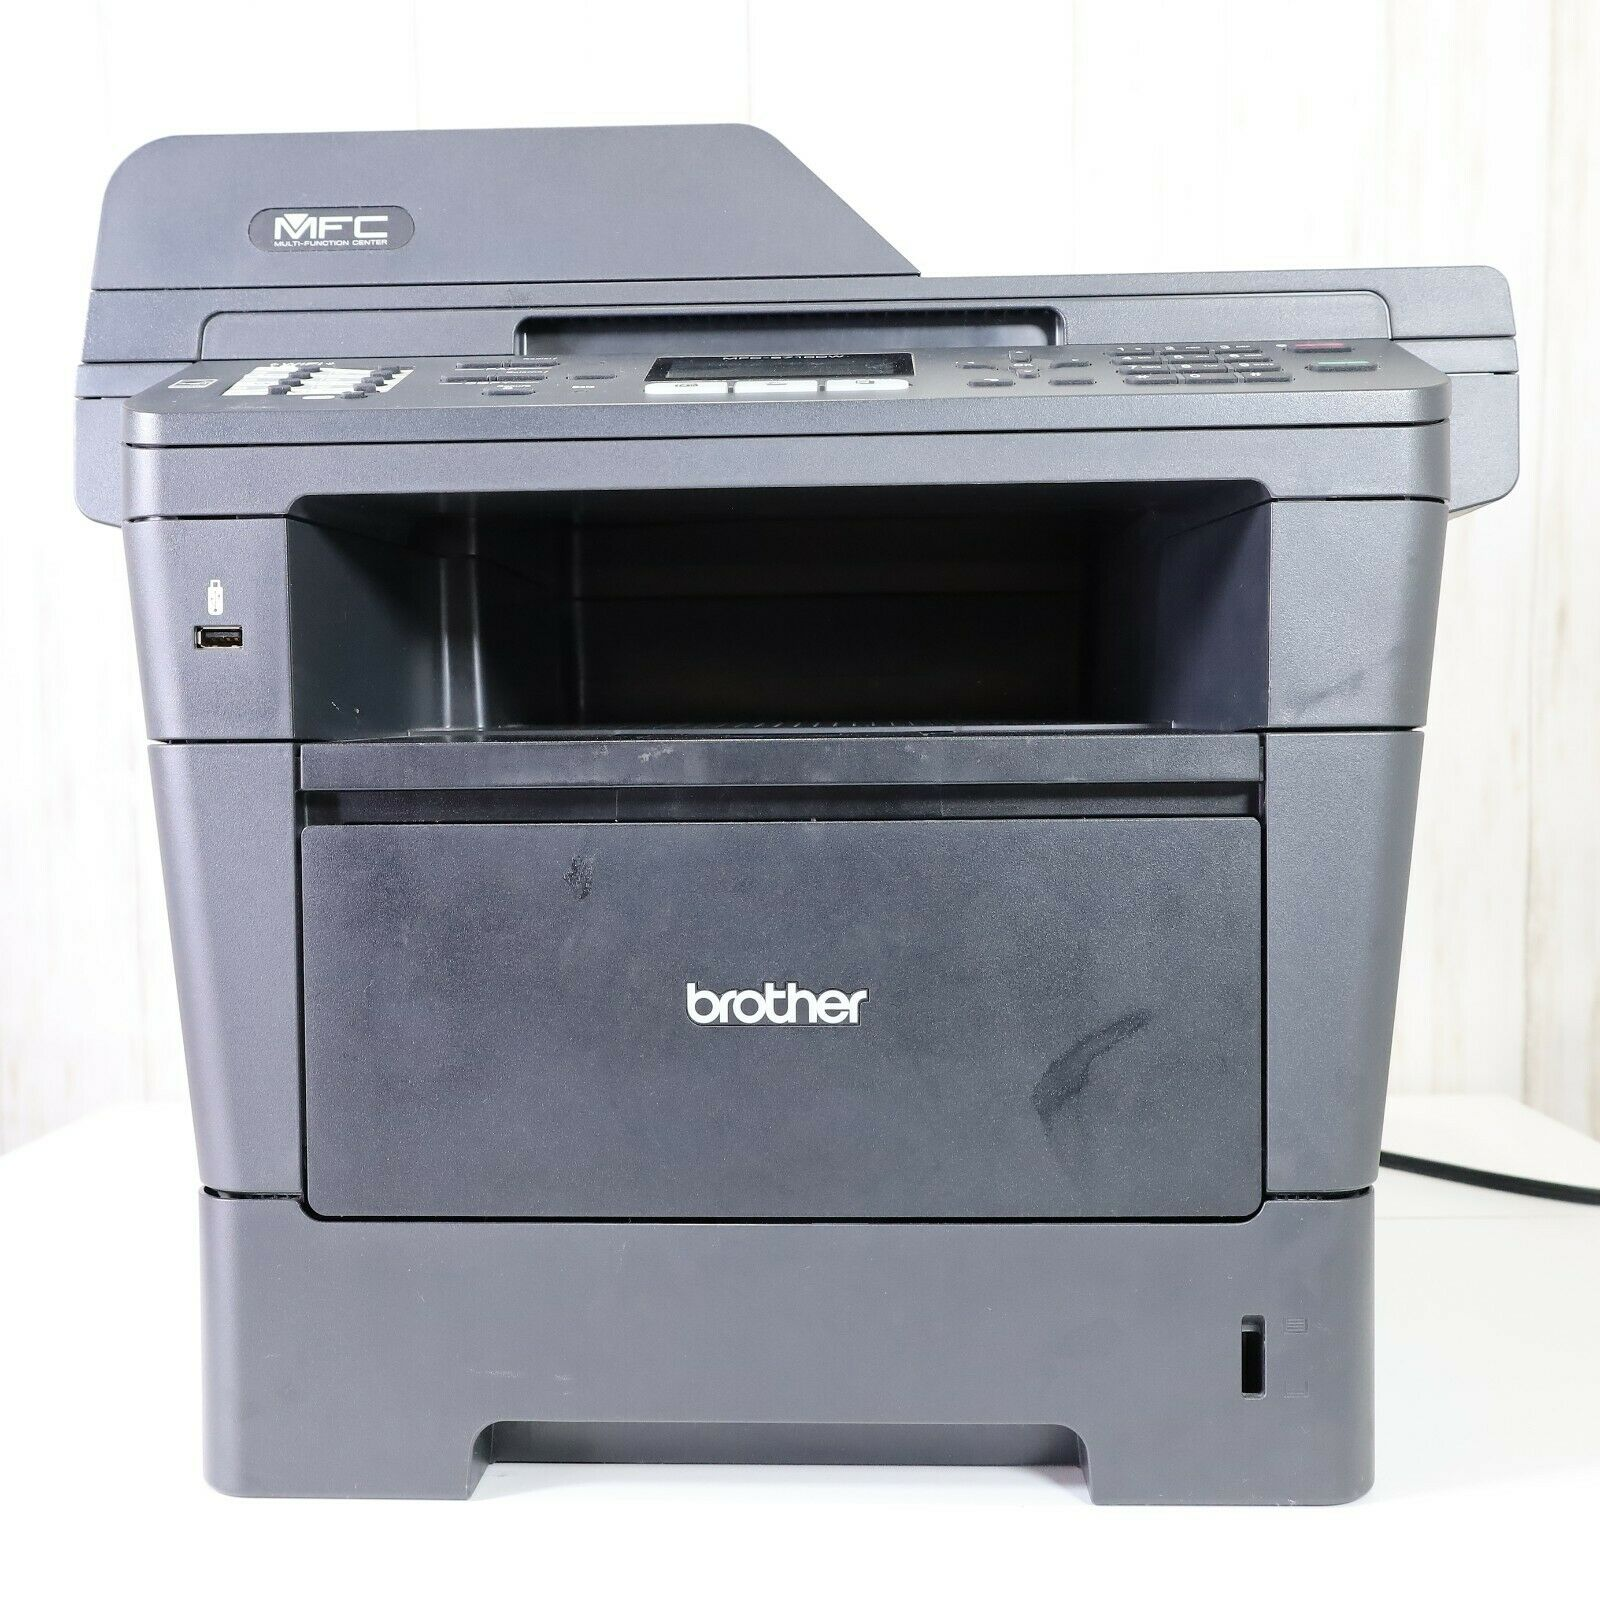 Brother MFC-8710DW Multifunction Wireless Mono Laser Printer